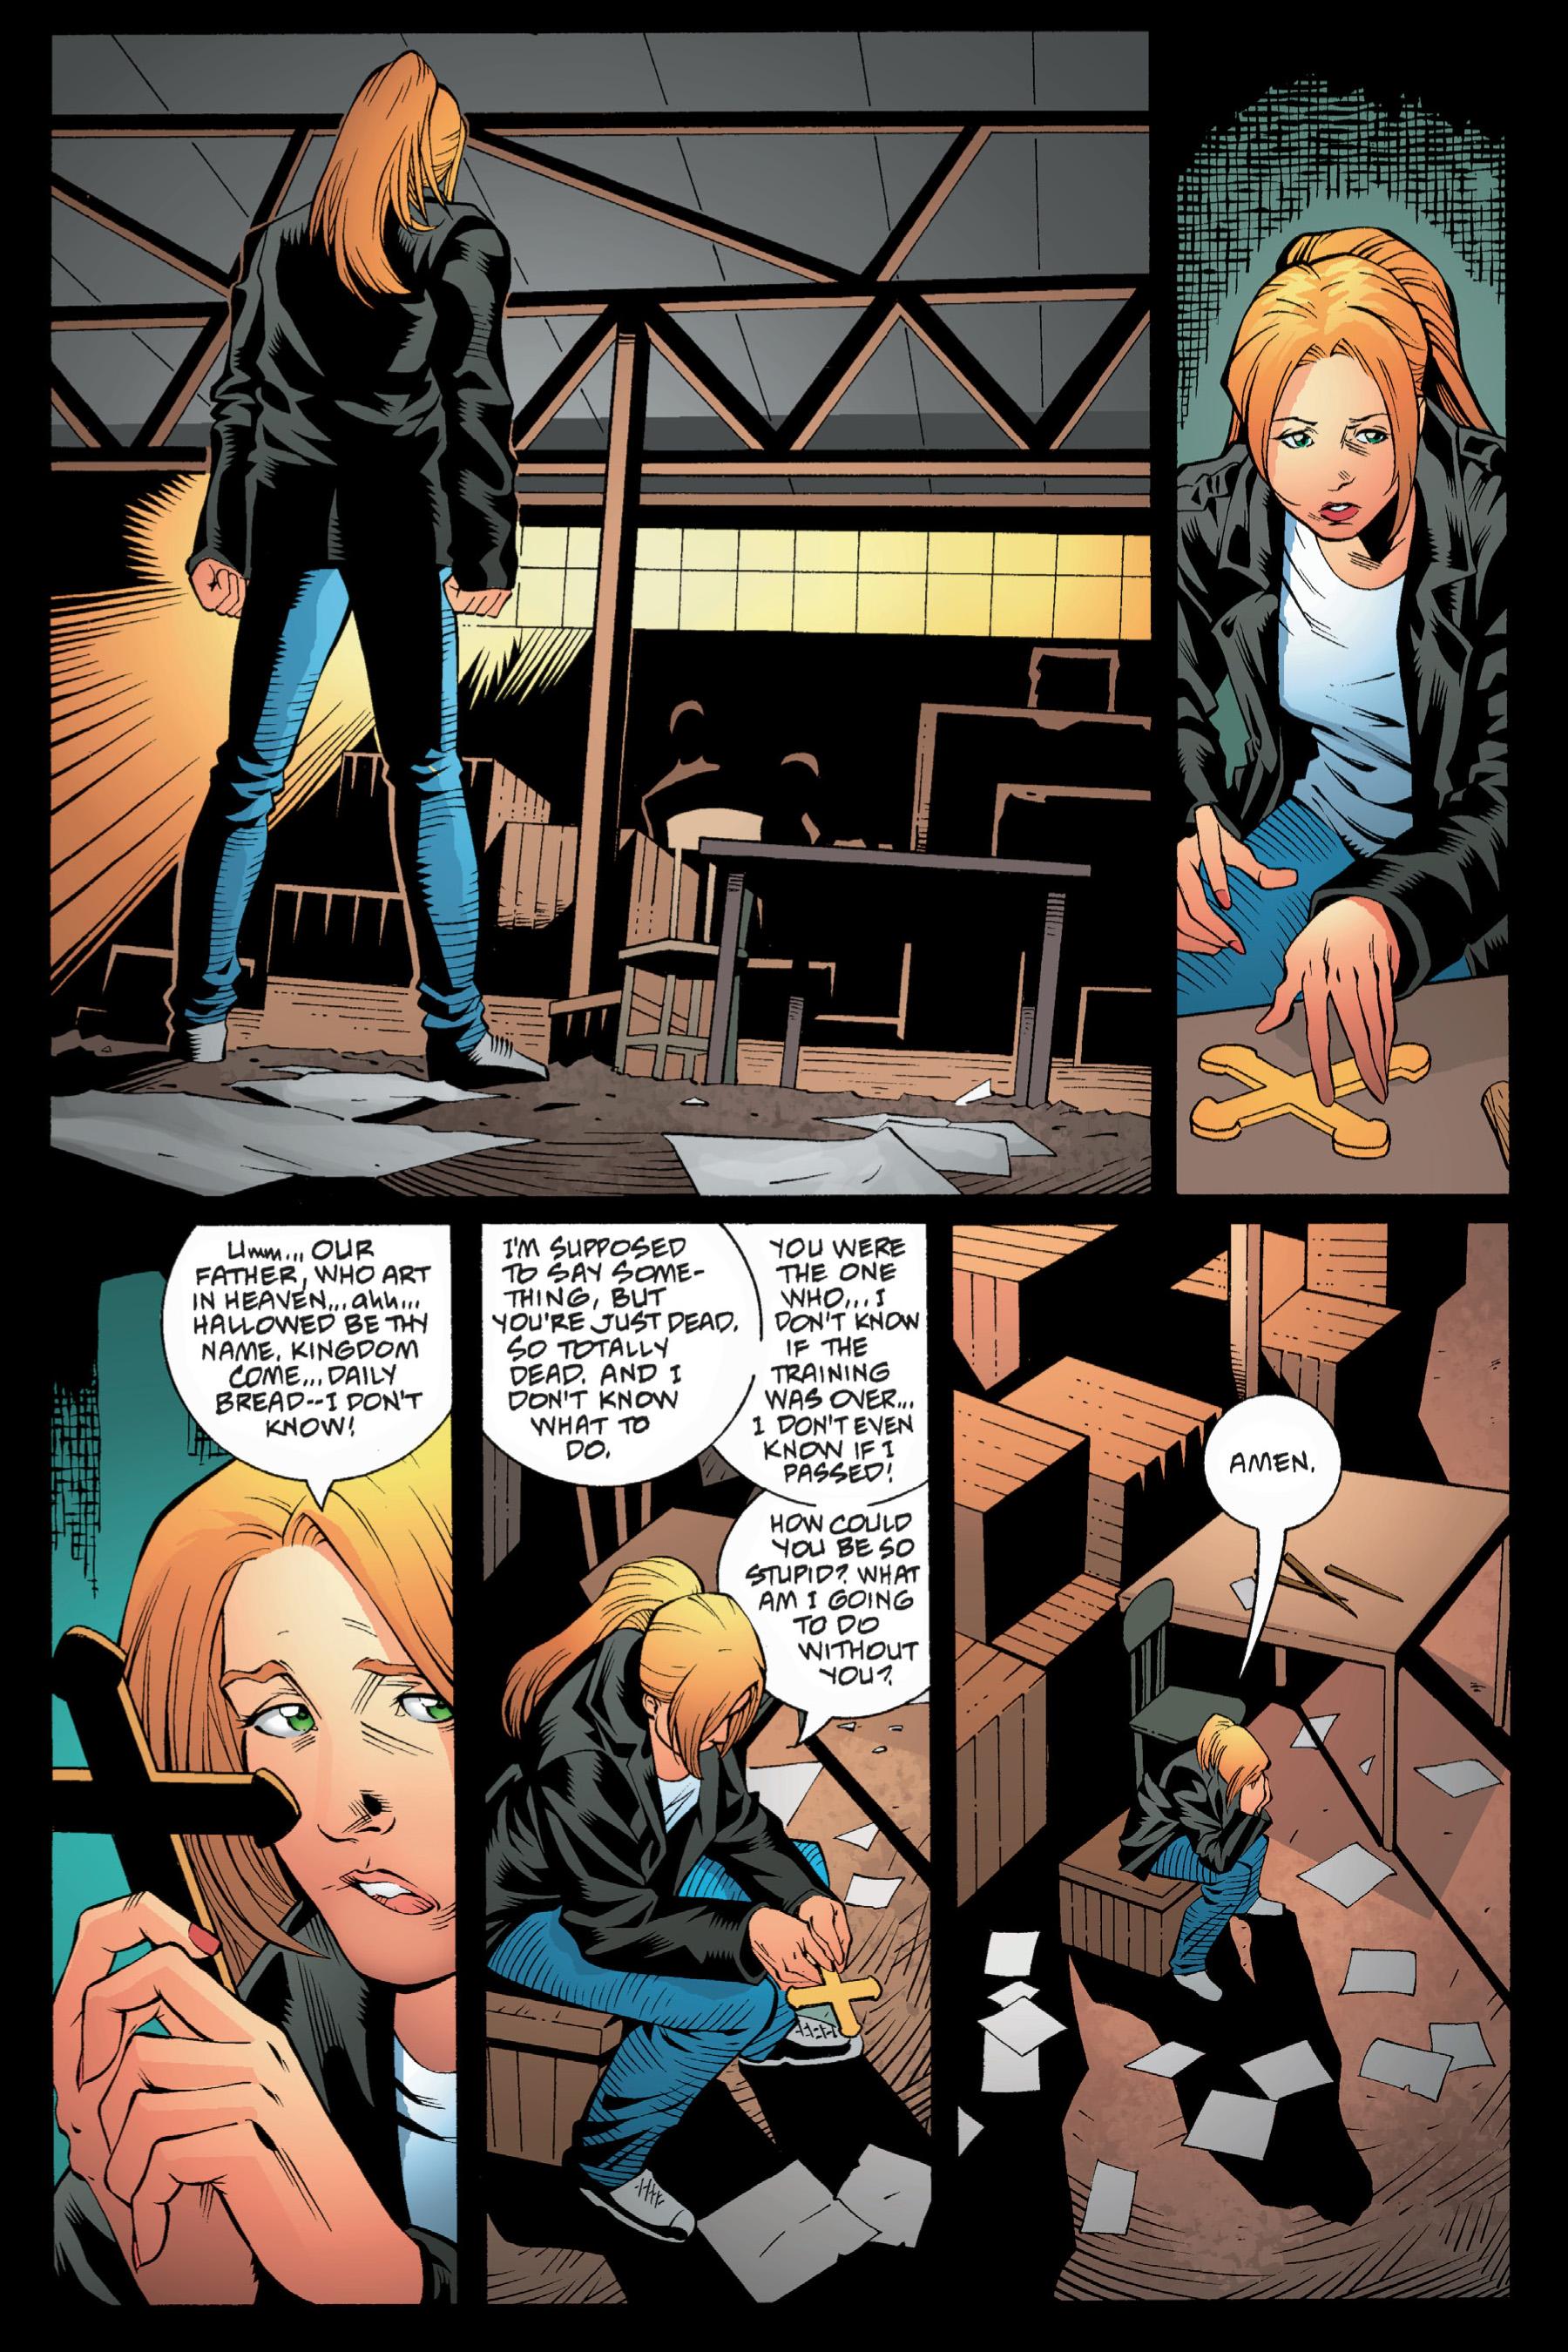 Read online Buffy the Vampire Slayer: Omnibus comic -  Issue # TPB 1 - 81